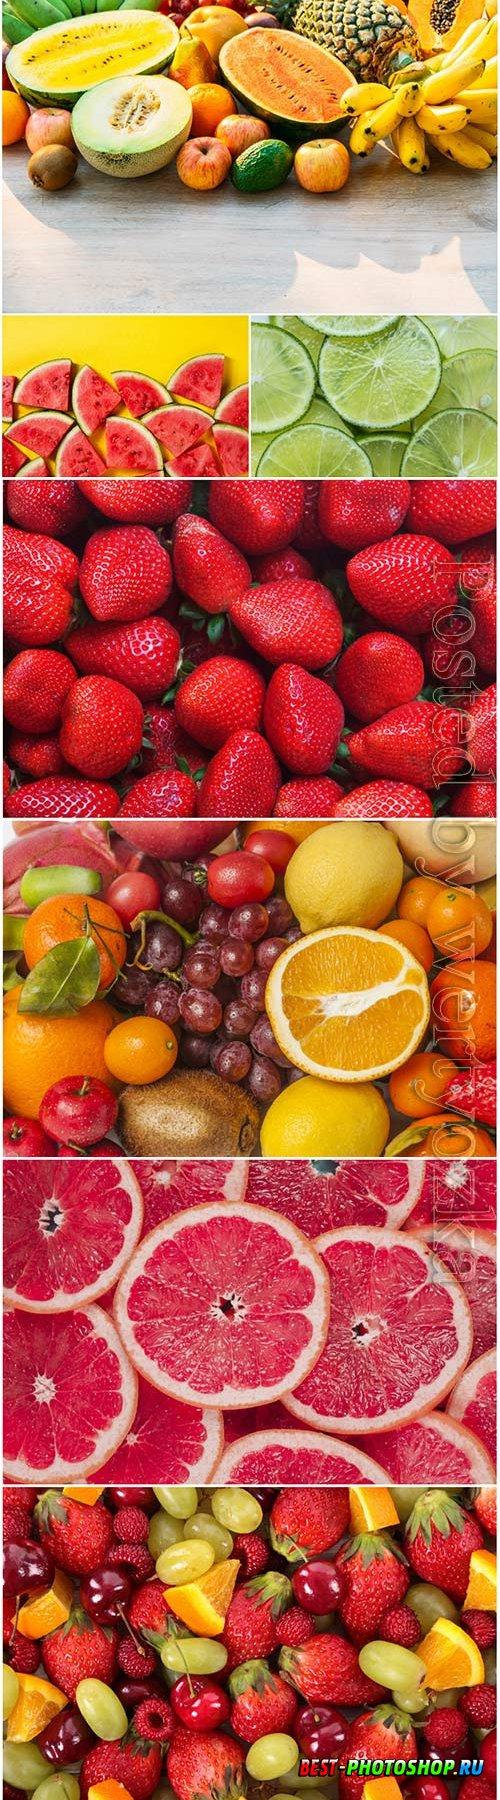 Fresh tasty berries, fruits and citrus stock photo